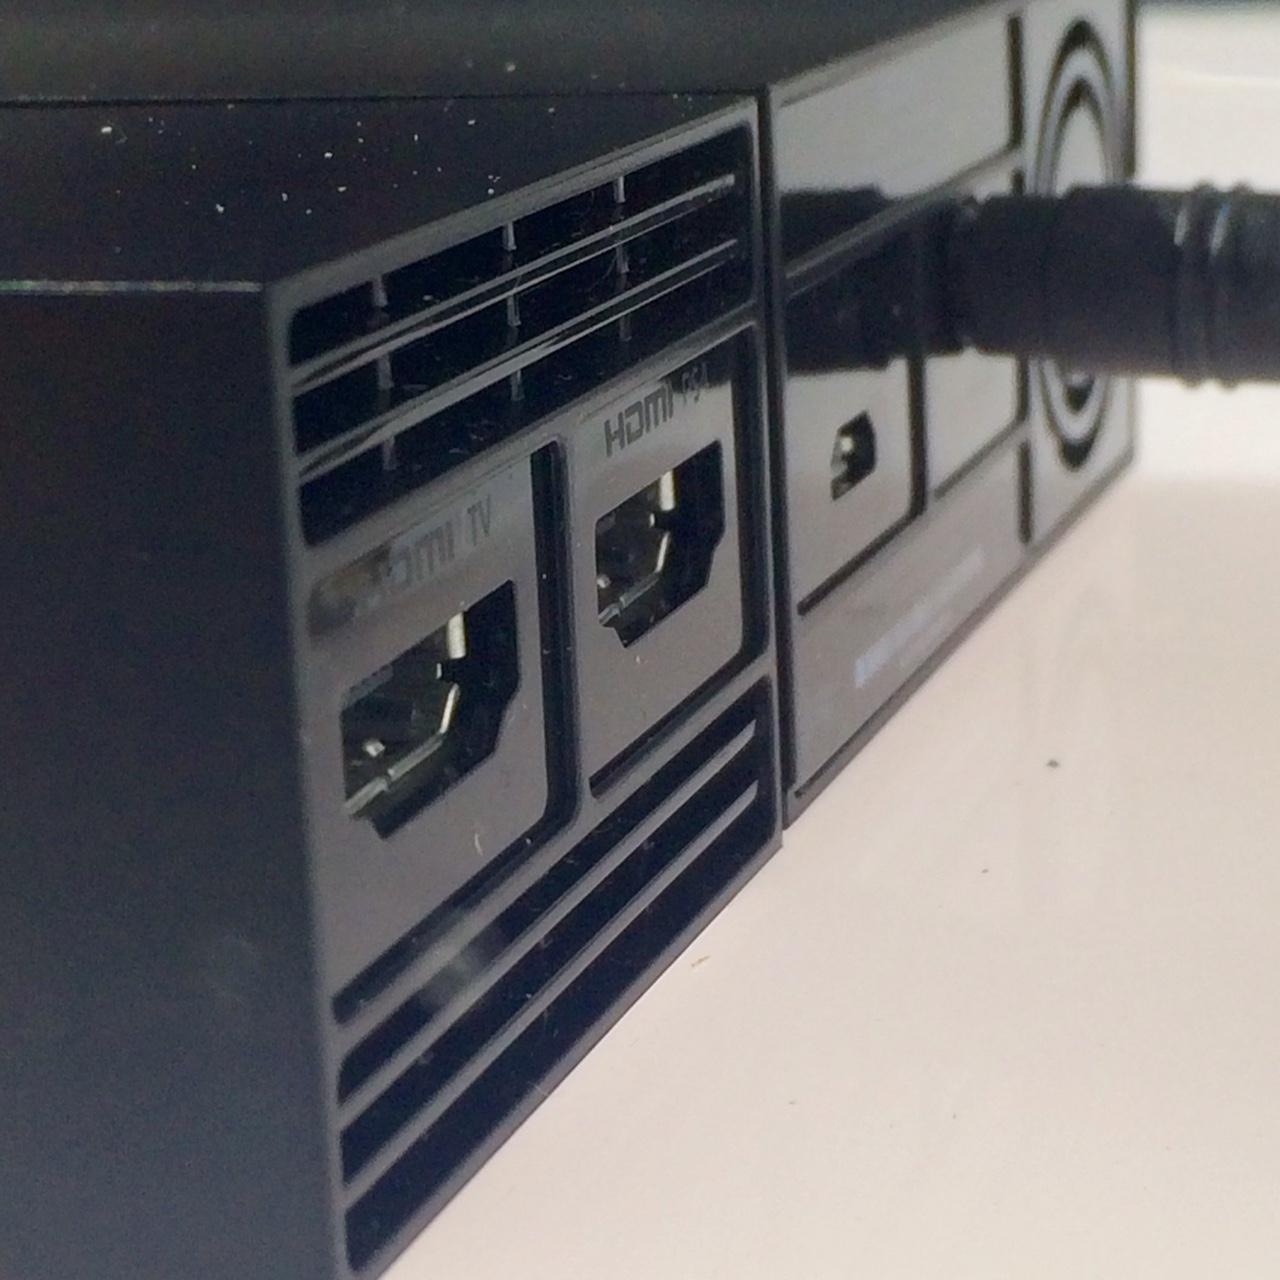 PlayStationVR Boitier 01